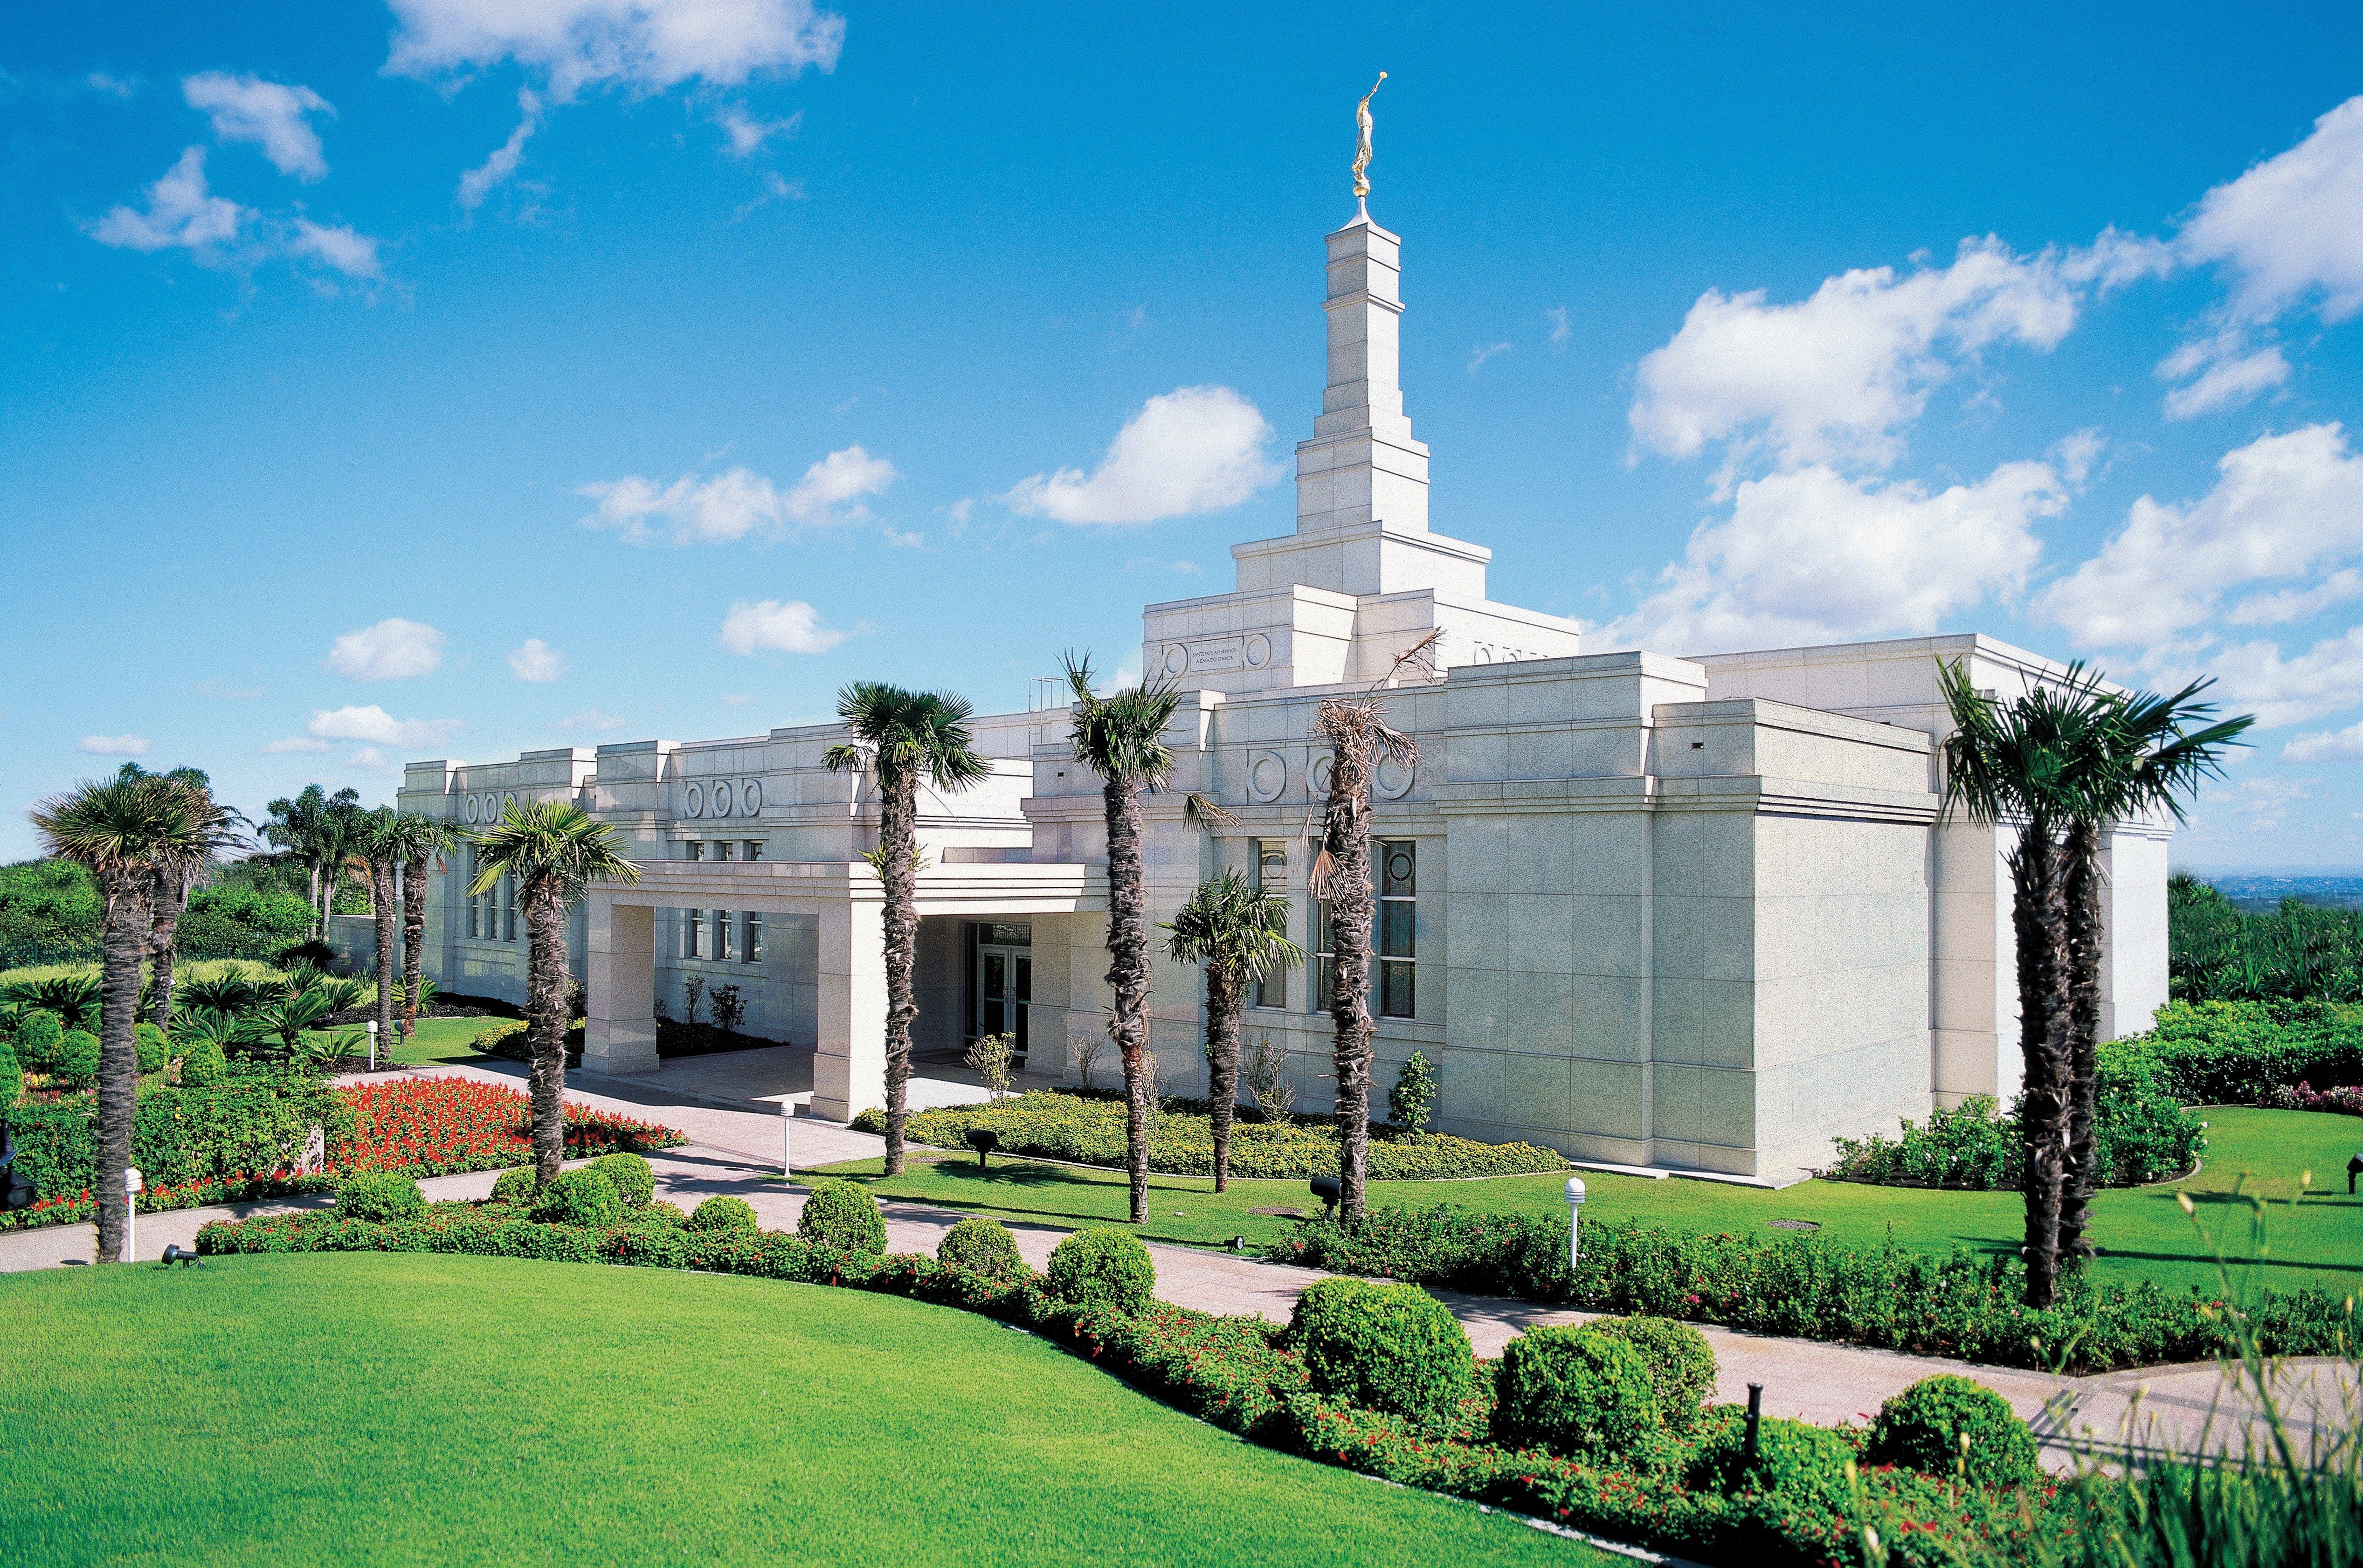 The Porto Alegre Brazil Temple, including the entrance and scenery.